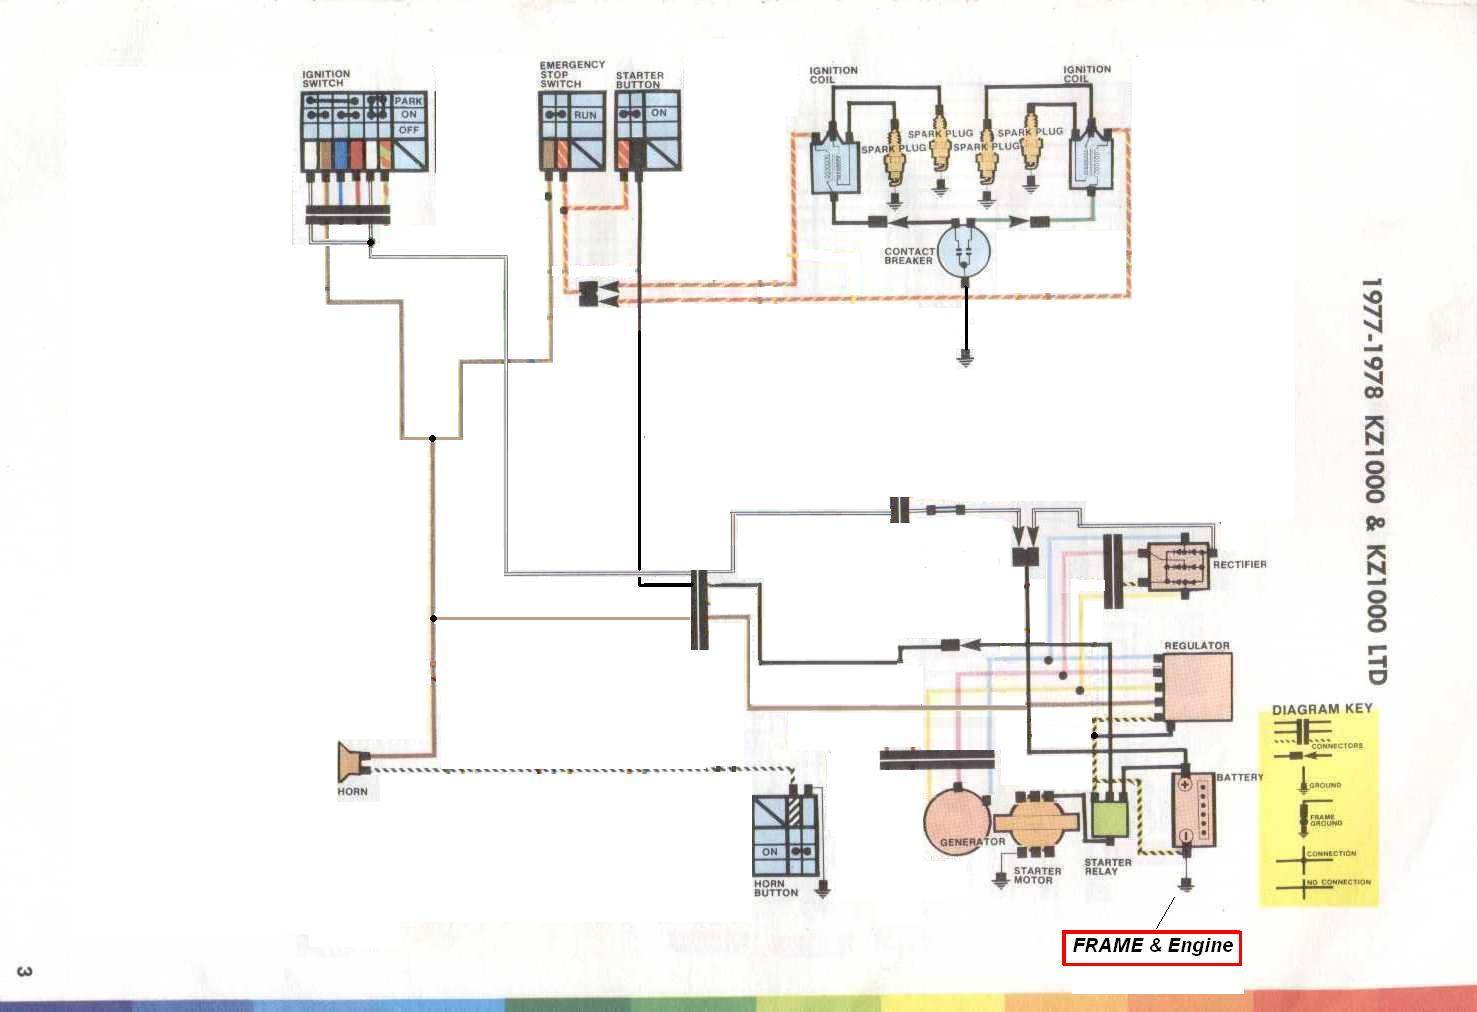 emergency stop switch wiring diagram dead electrical kzrider forum kzrider  kz  z1   z motorcycle  dead electrical kzrider forum